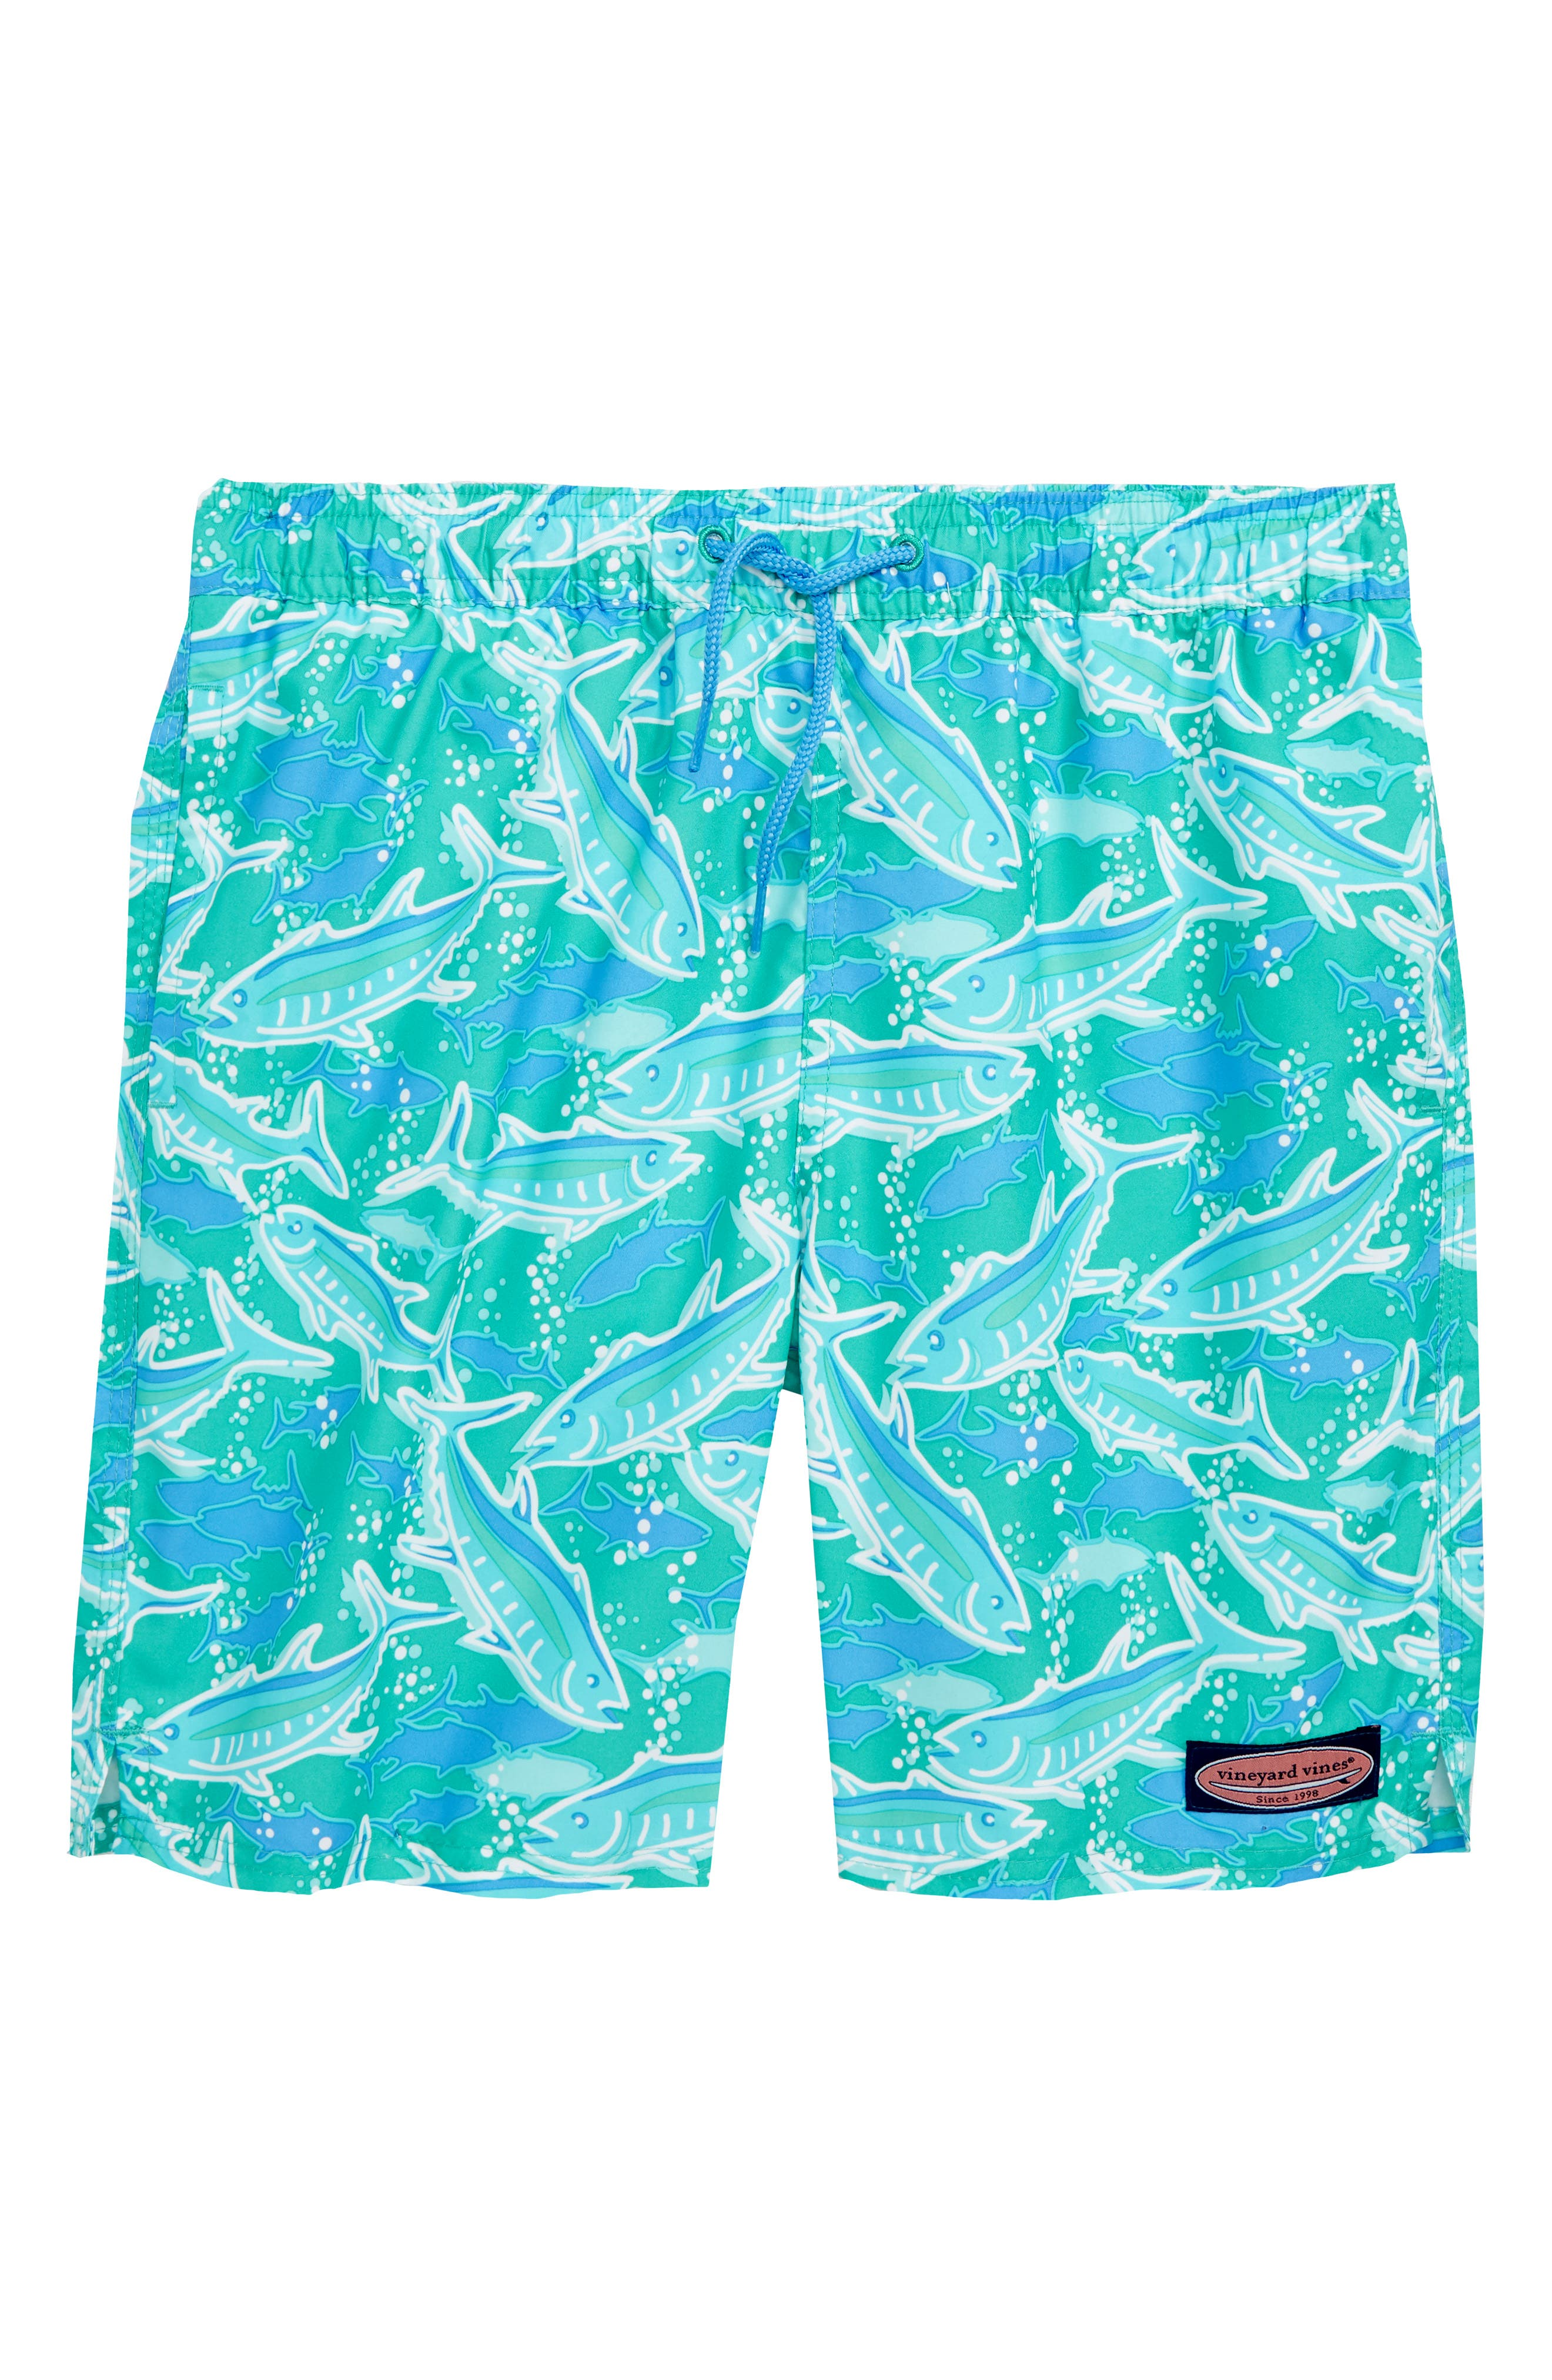 Chappy School of Tuna Swim Trunks,                         Main,                         color, 440